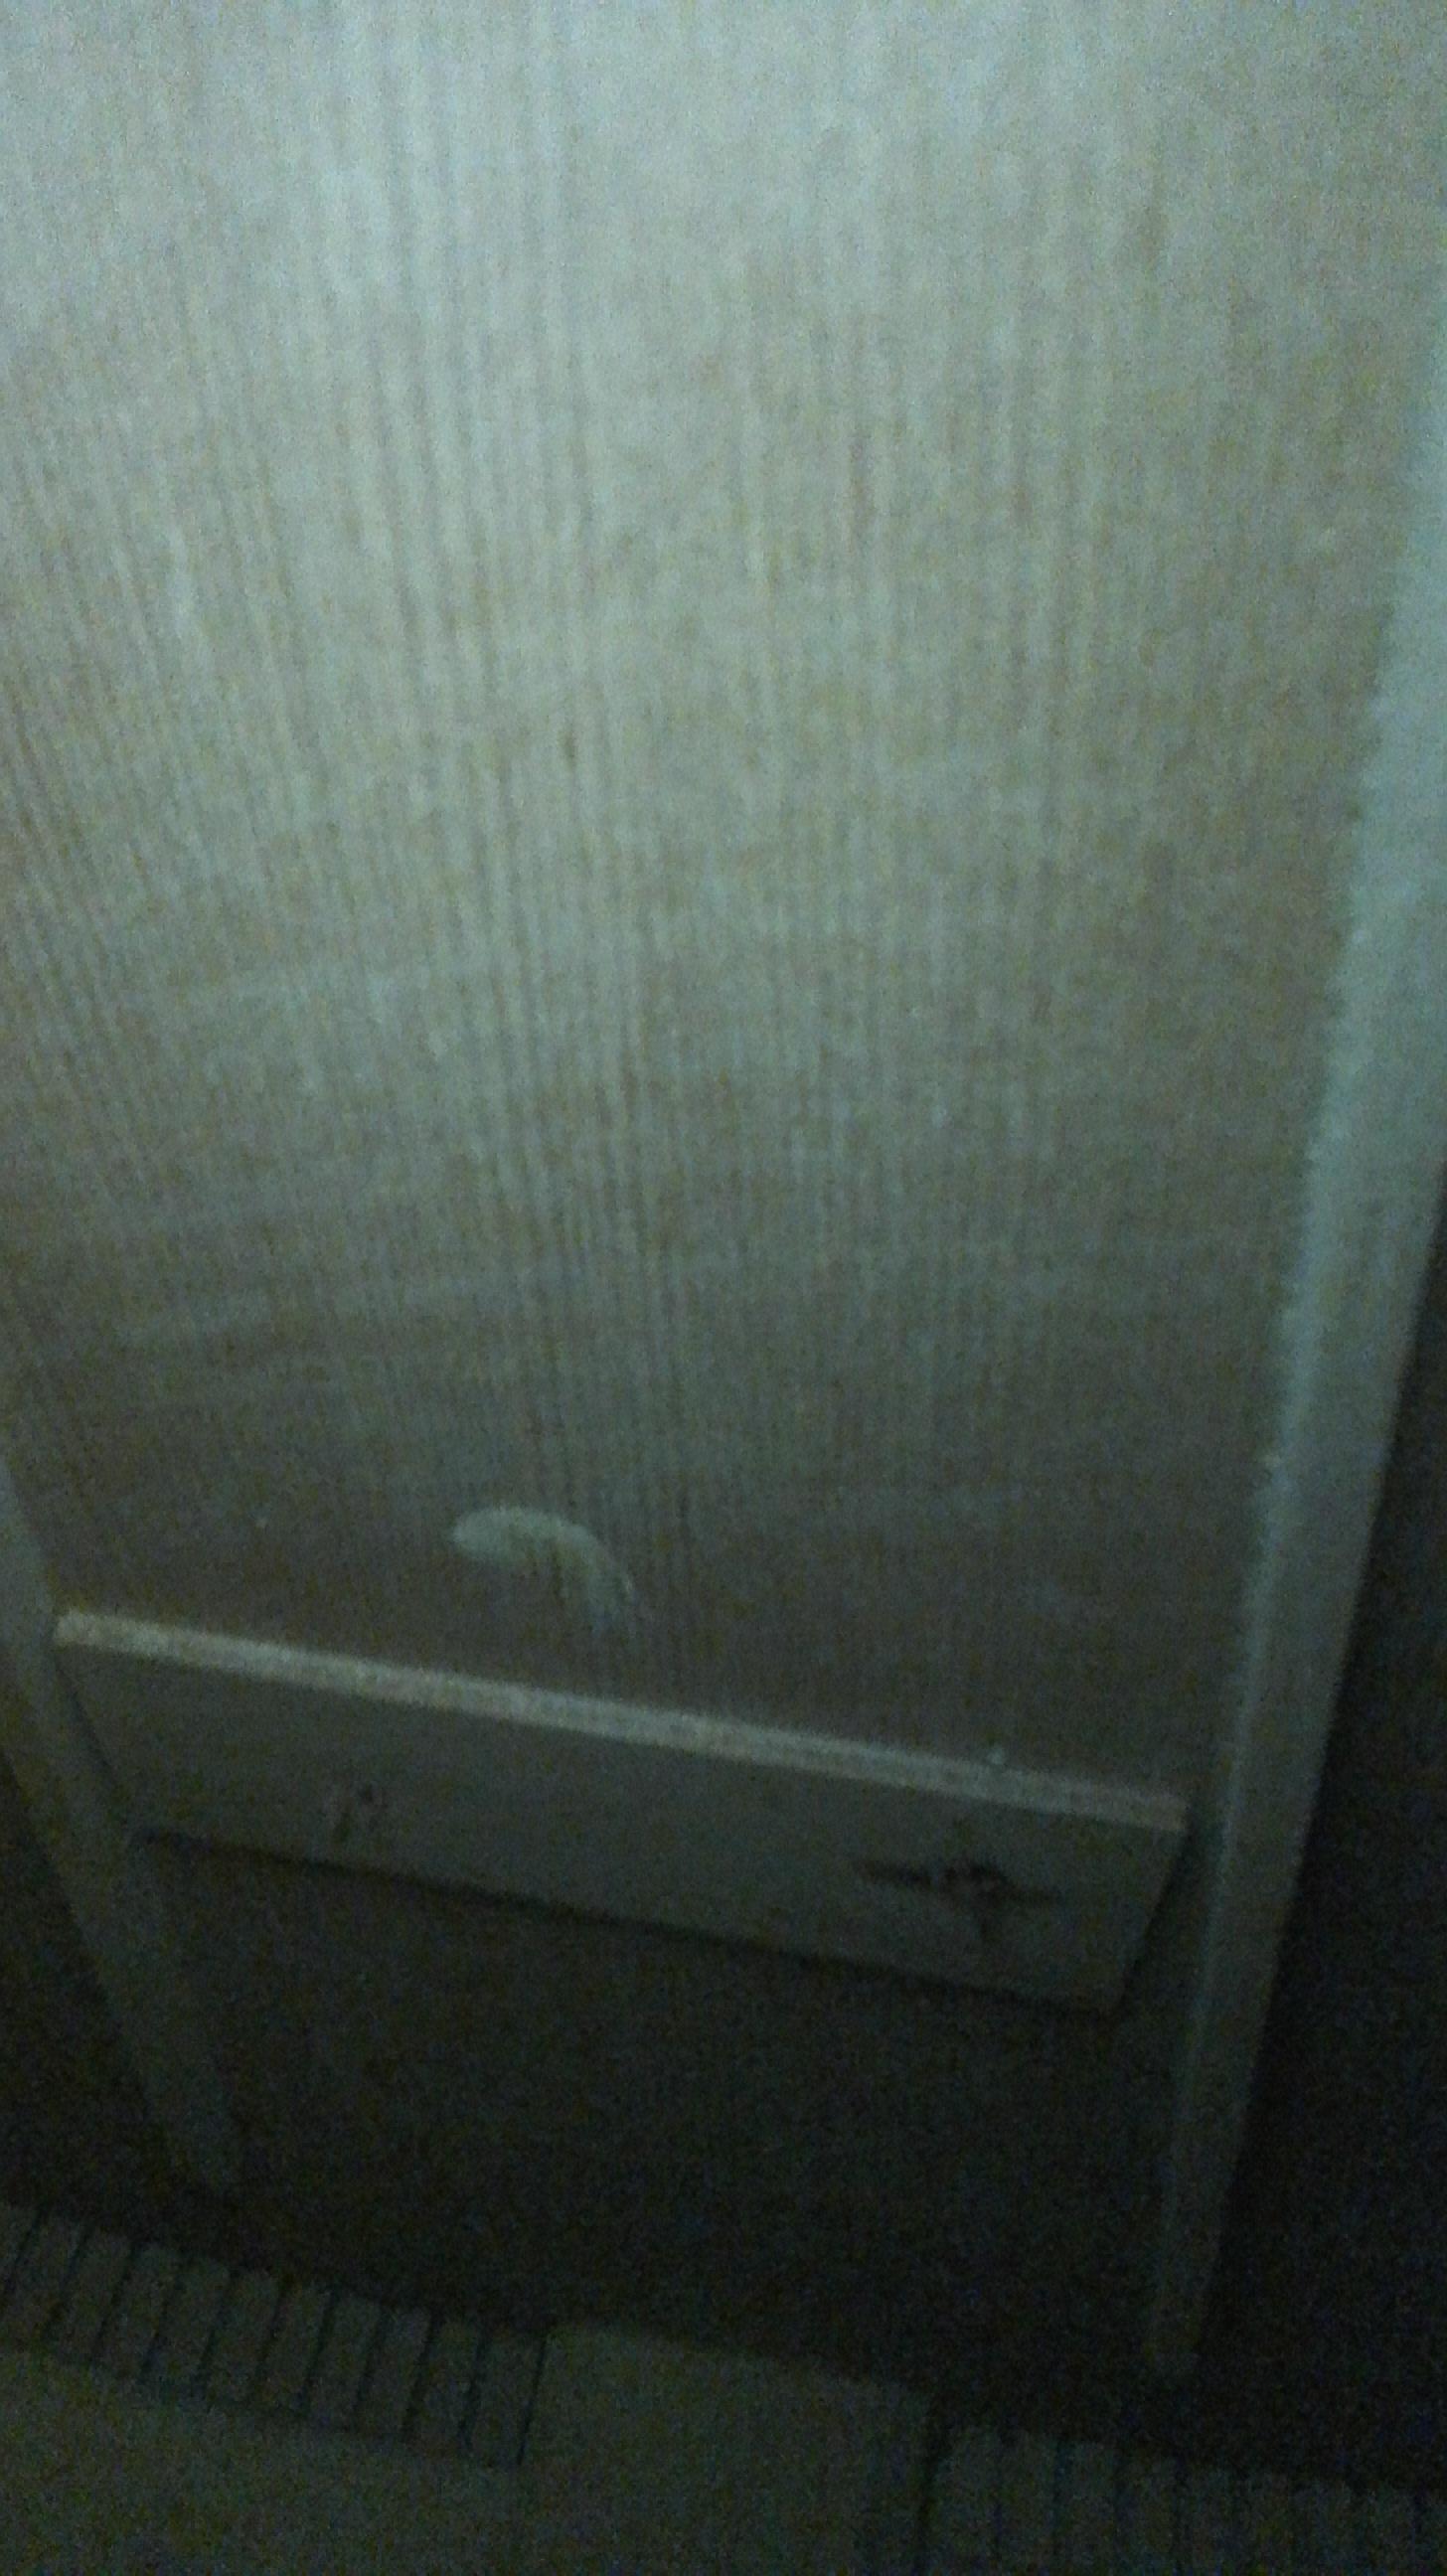 interno soundboard - 1